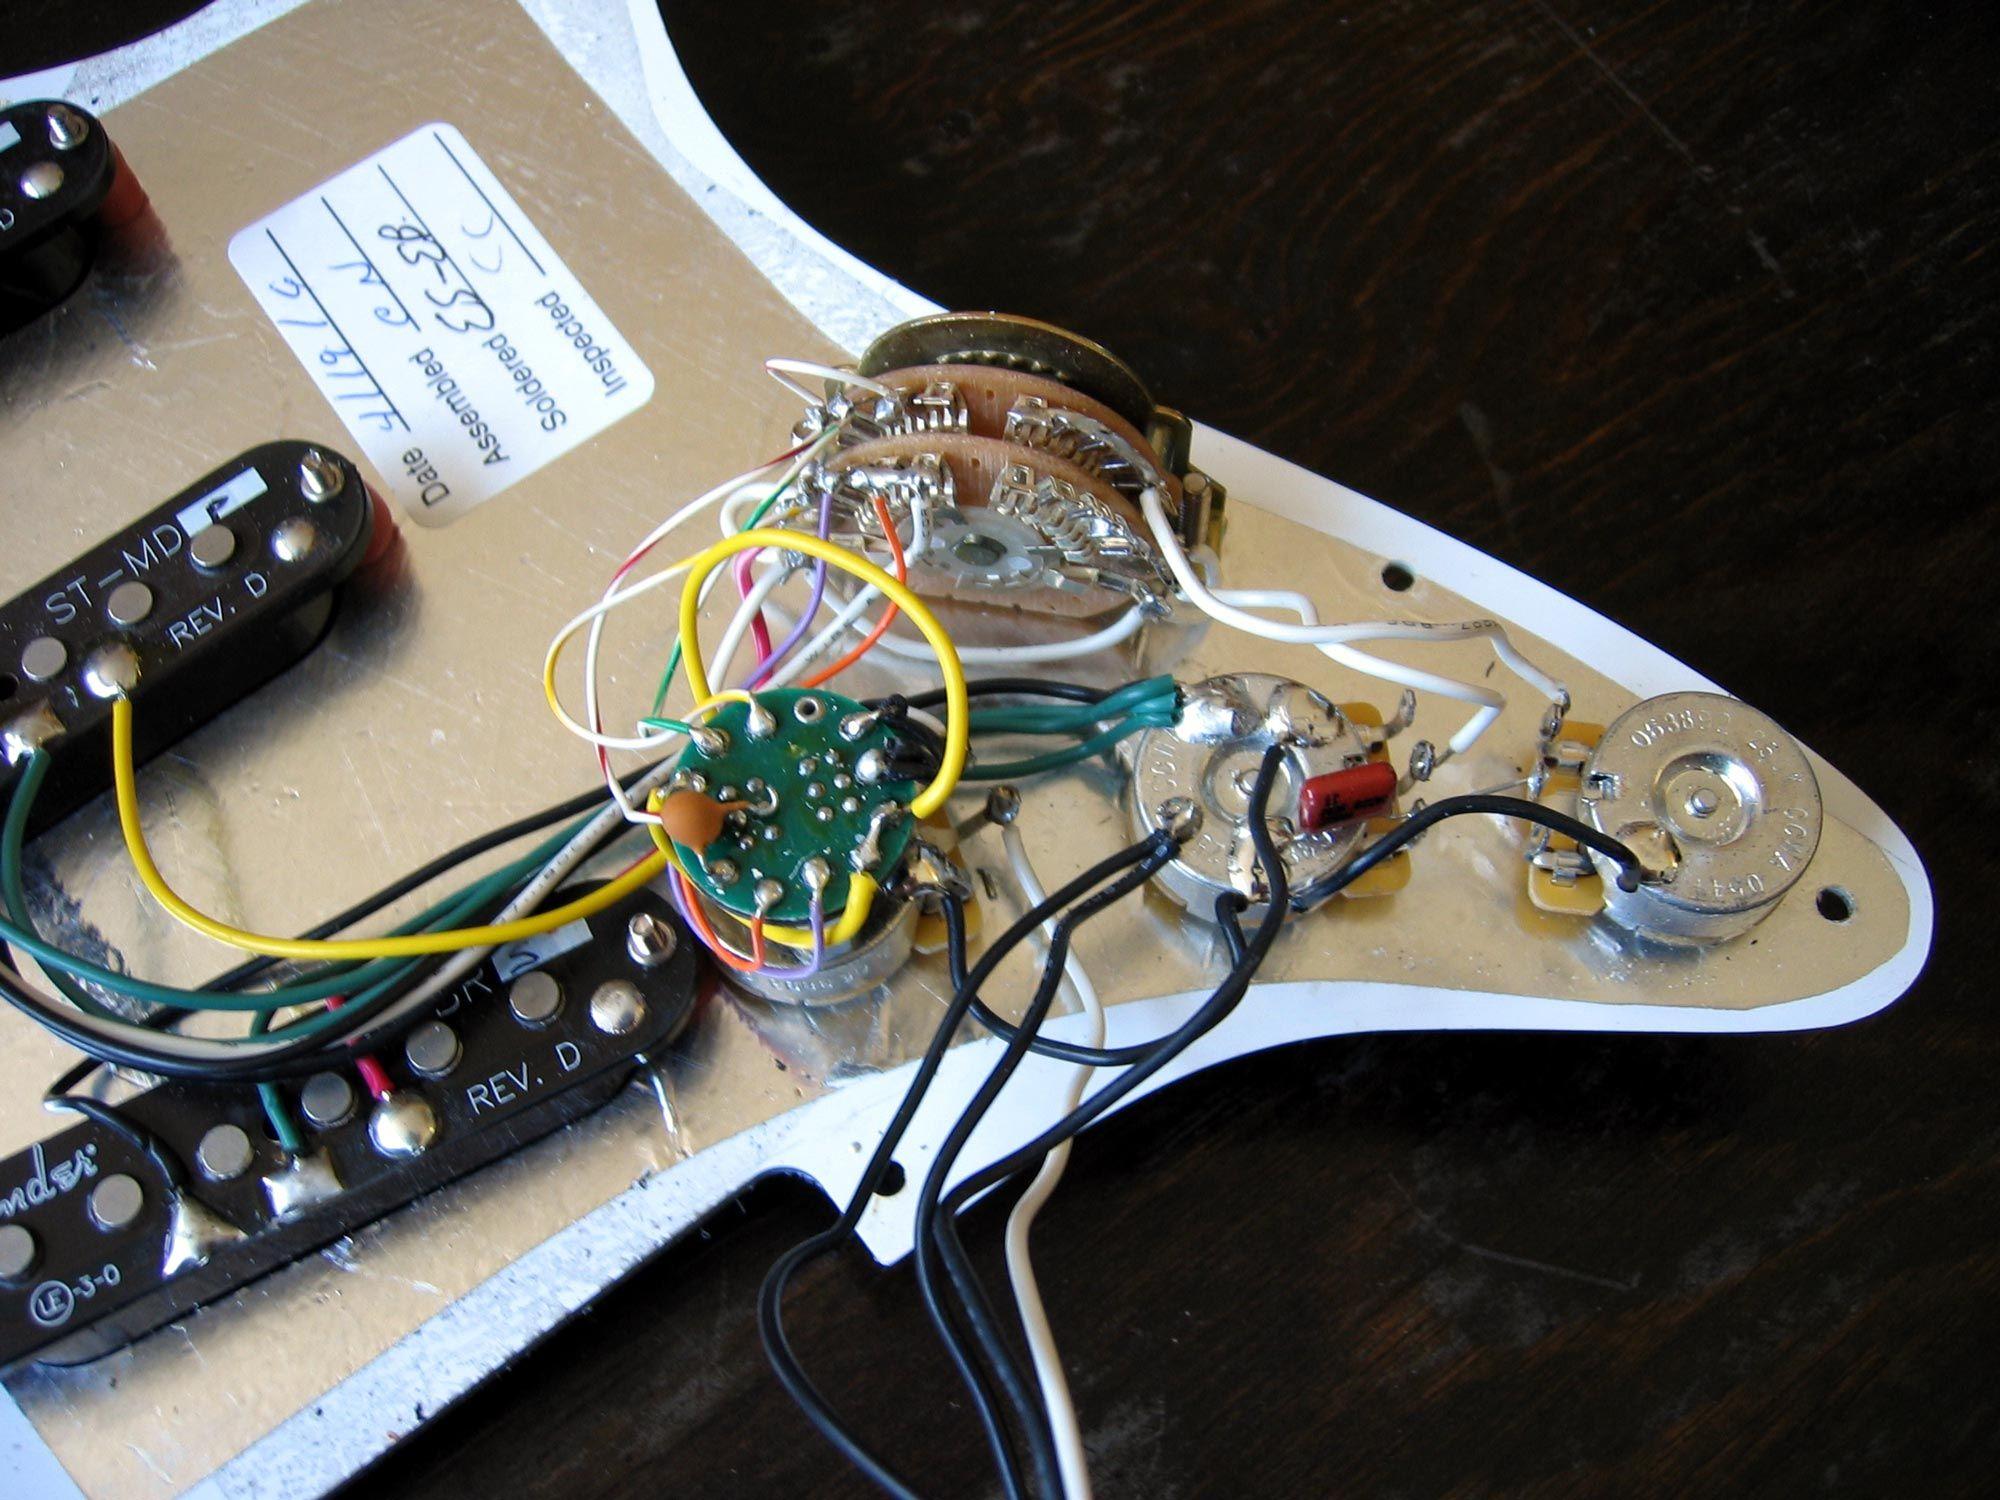 [SCHEMATICS_4FD]  KD_2886] Fender Stratocaster Deluxe S1 Wiring Diagram Wiring Diagram   Fender American Deluxe Wiring Diagram      sulf.crove.aidew.illuminateatx.org